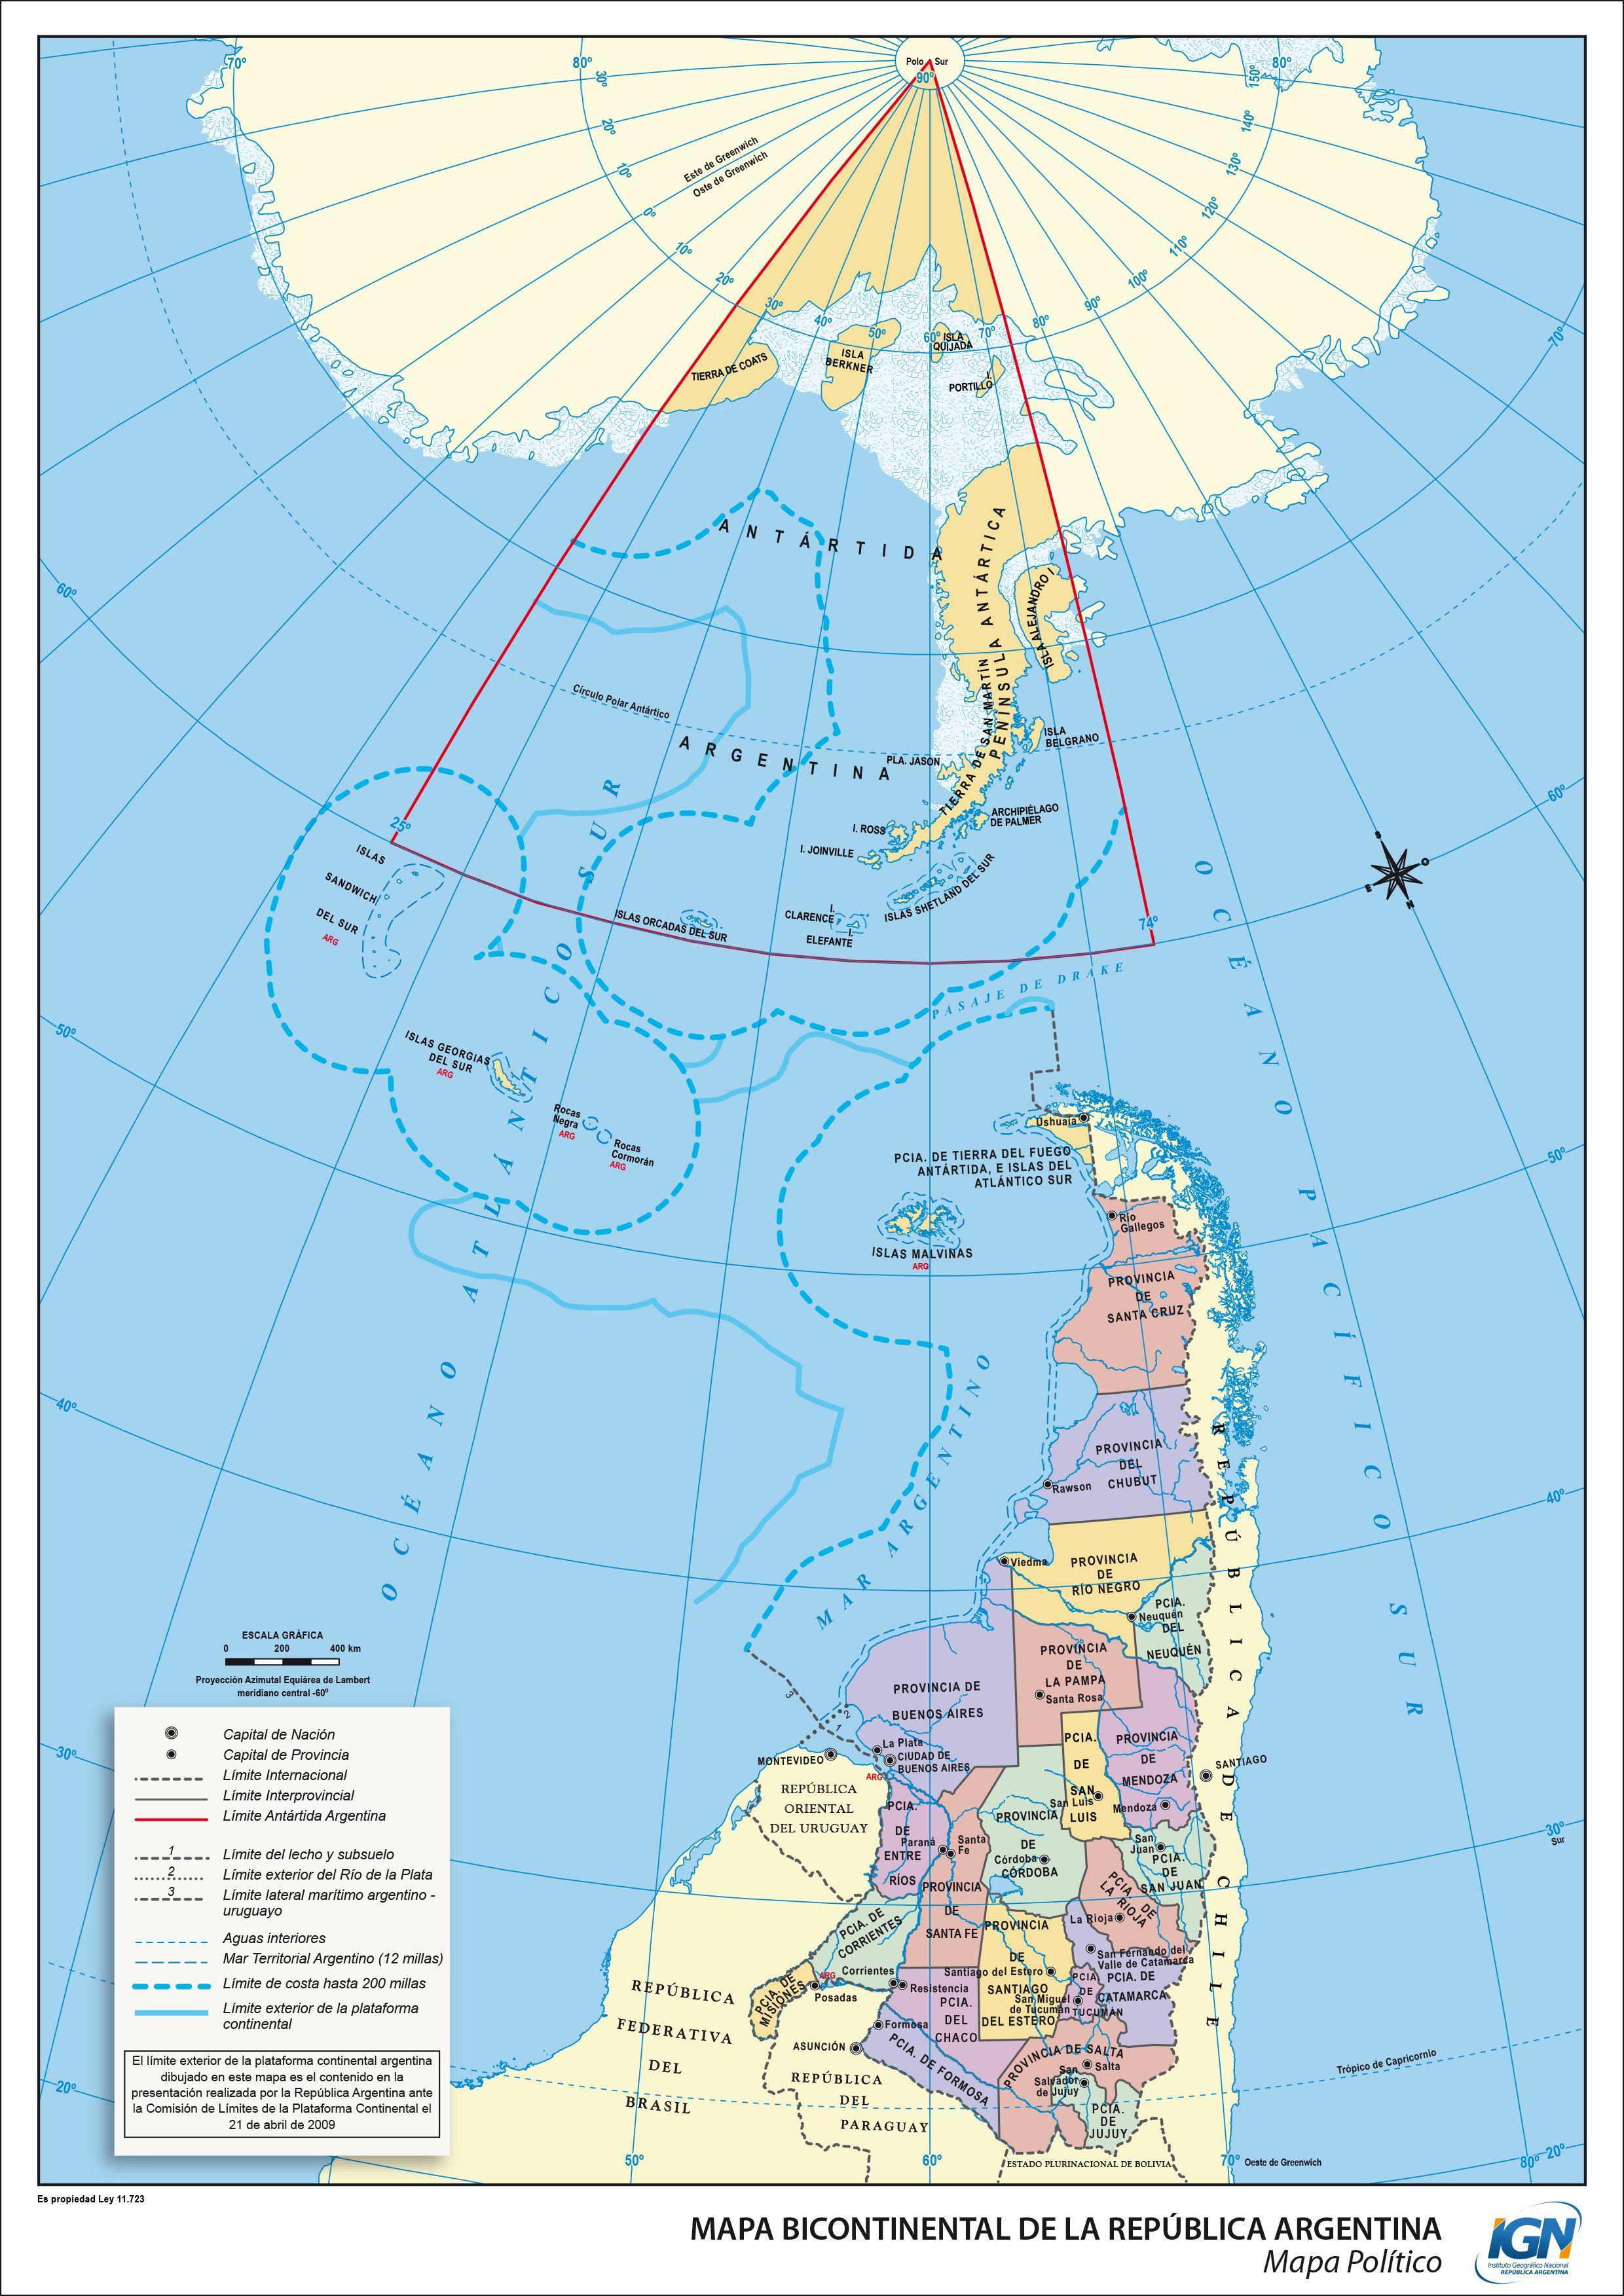 Argentina And AntarcticSouth Atlantic Claims From National - Antarctica political map